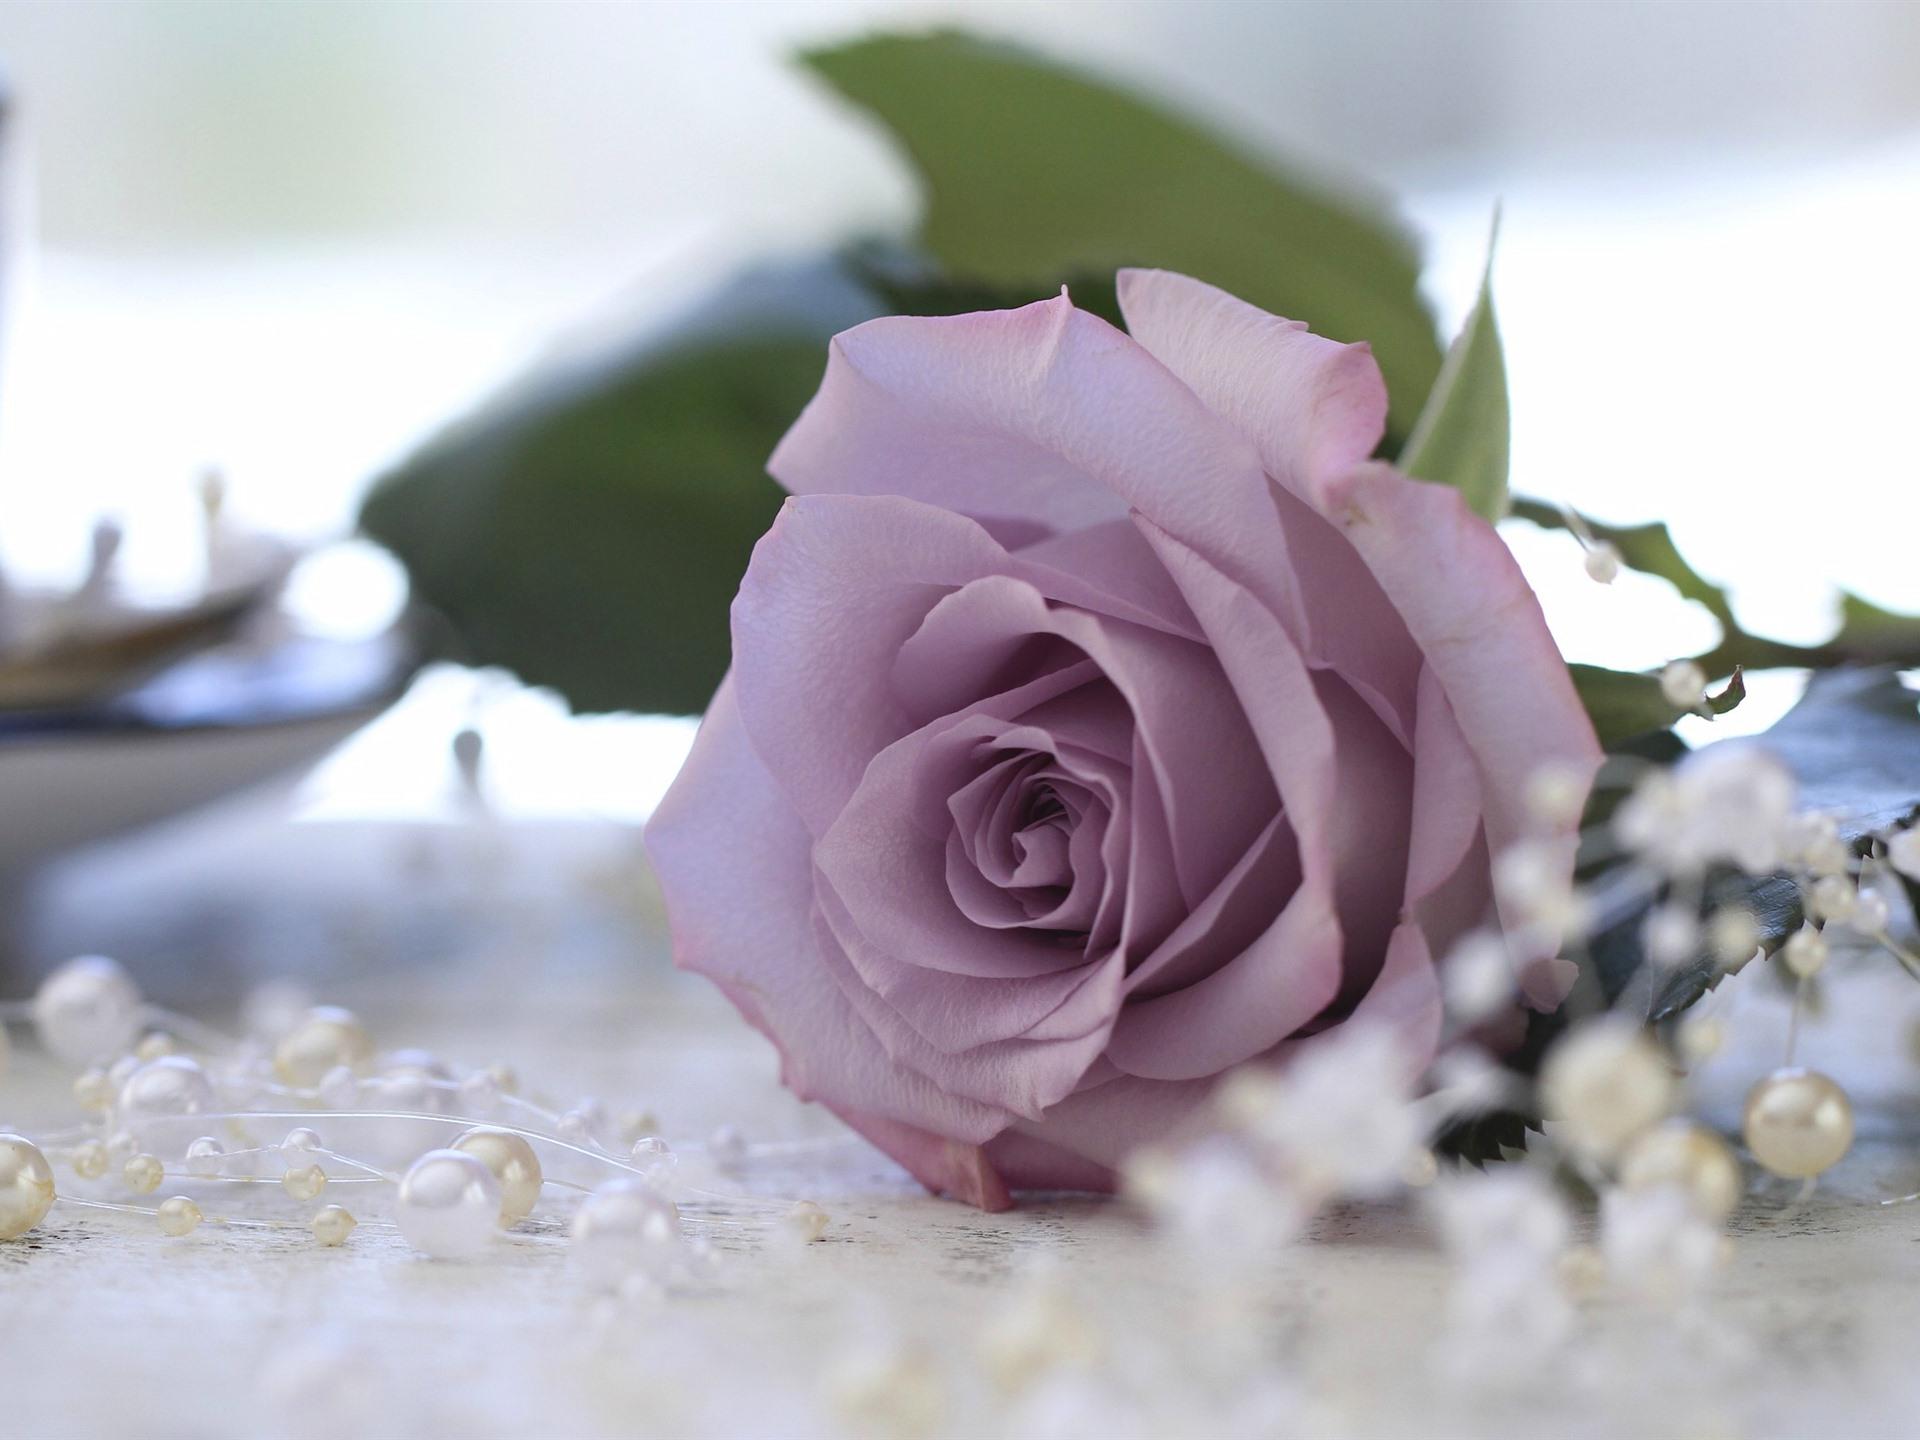 Lila Rose Perlen 1920x1440 Hd Hintergrundbilder Hd Bild